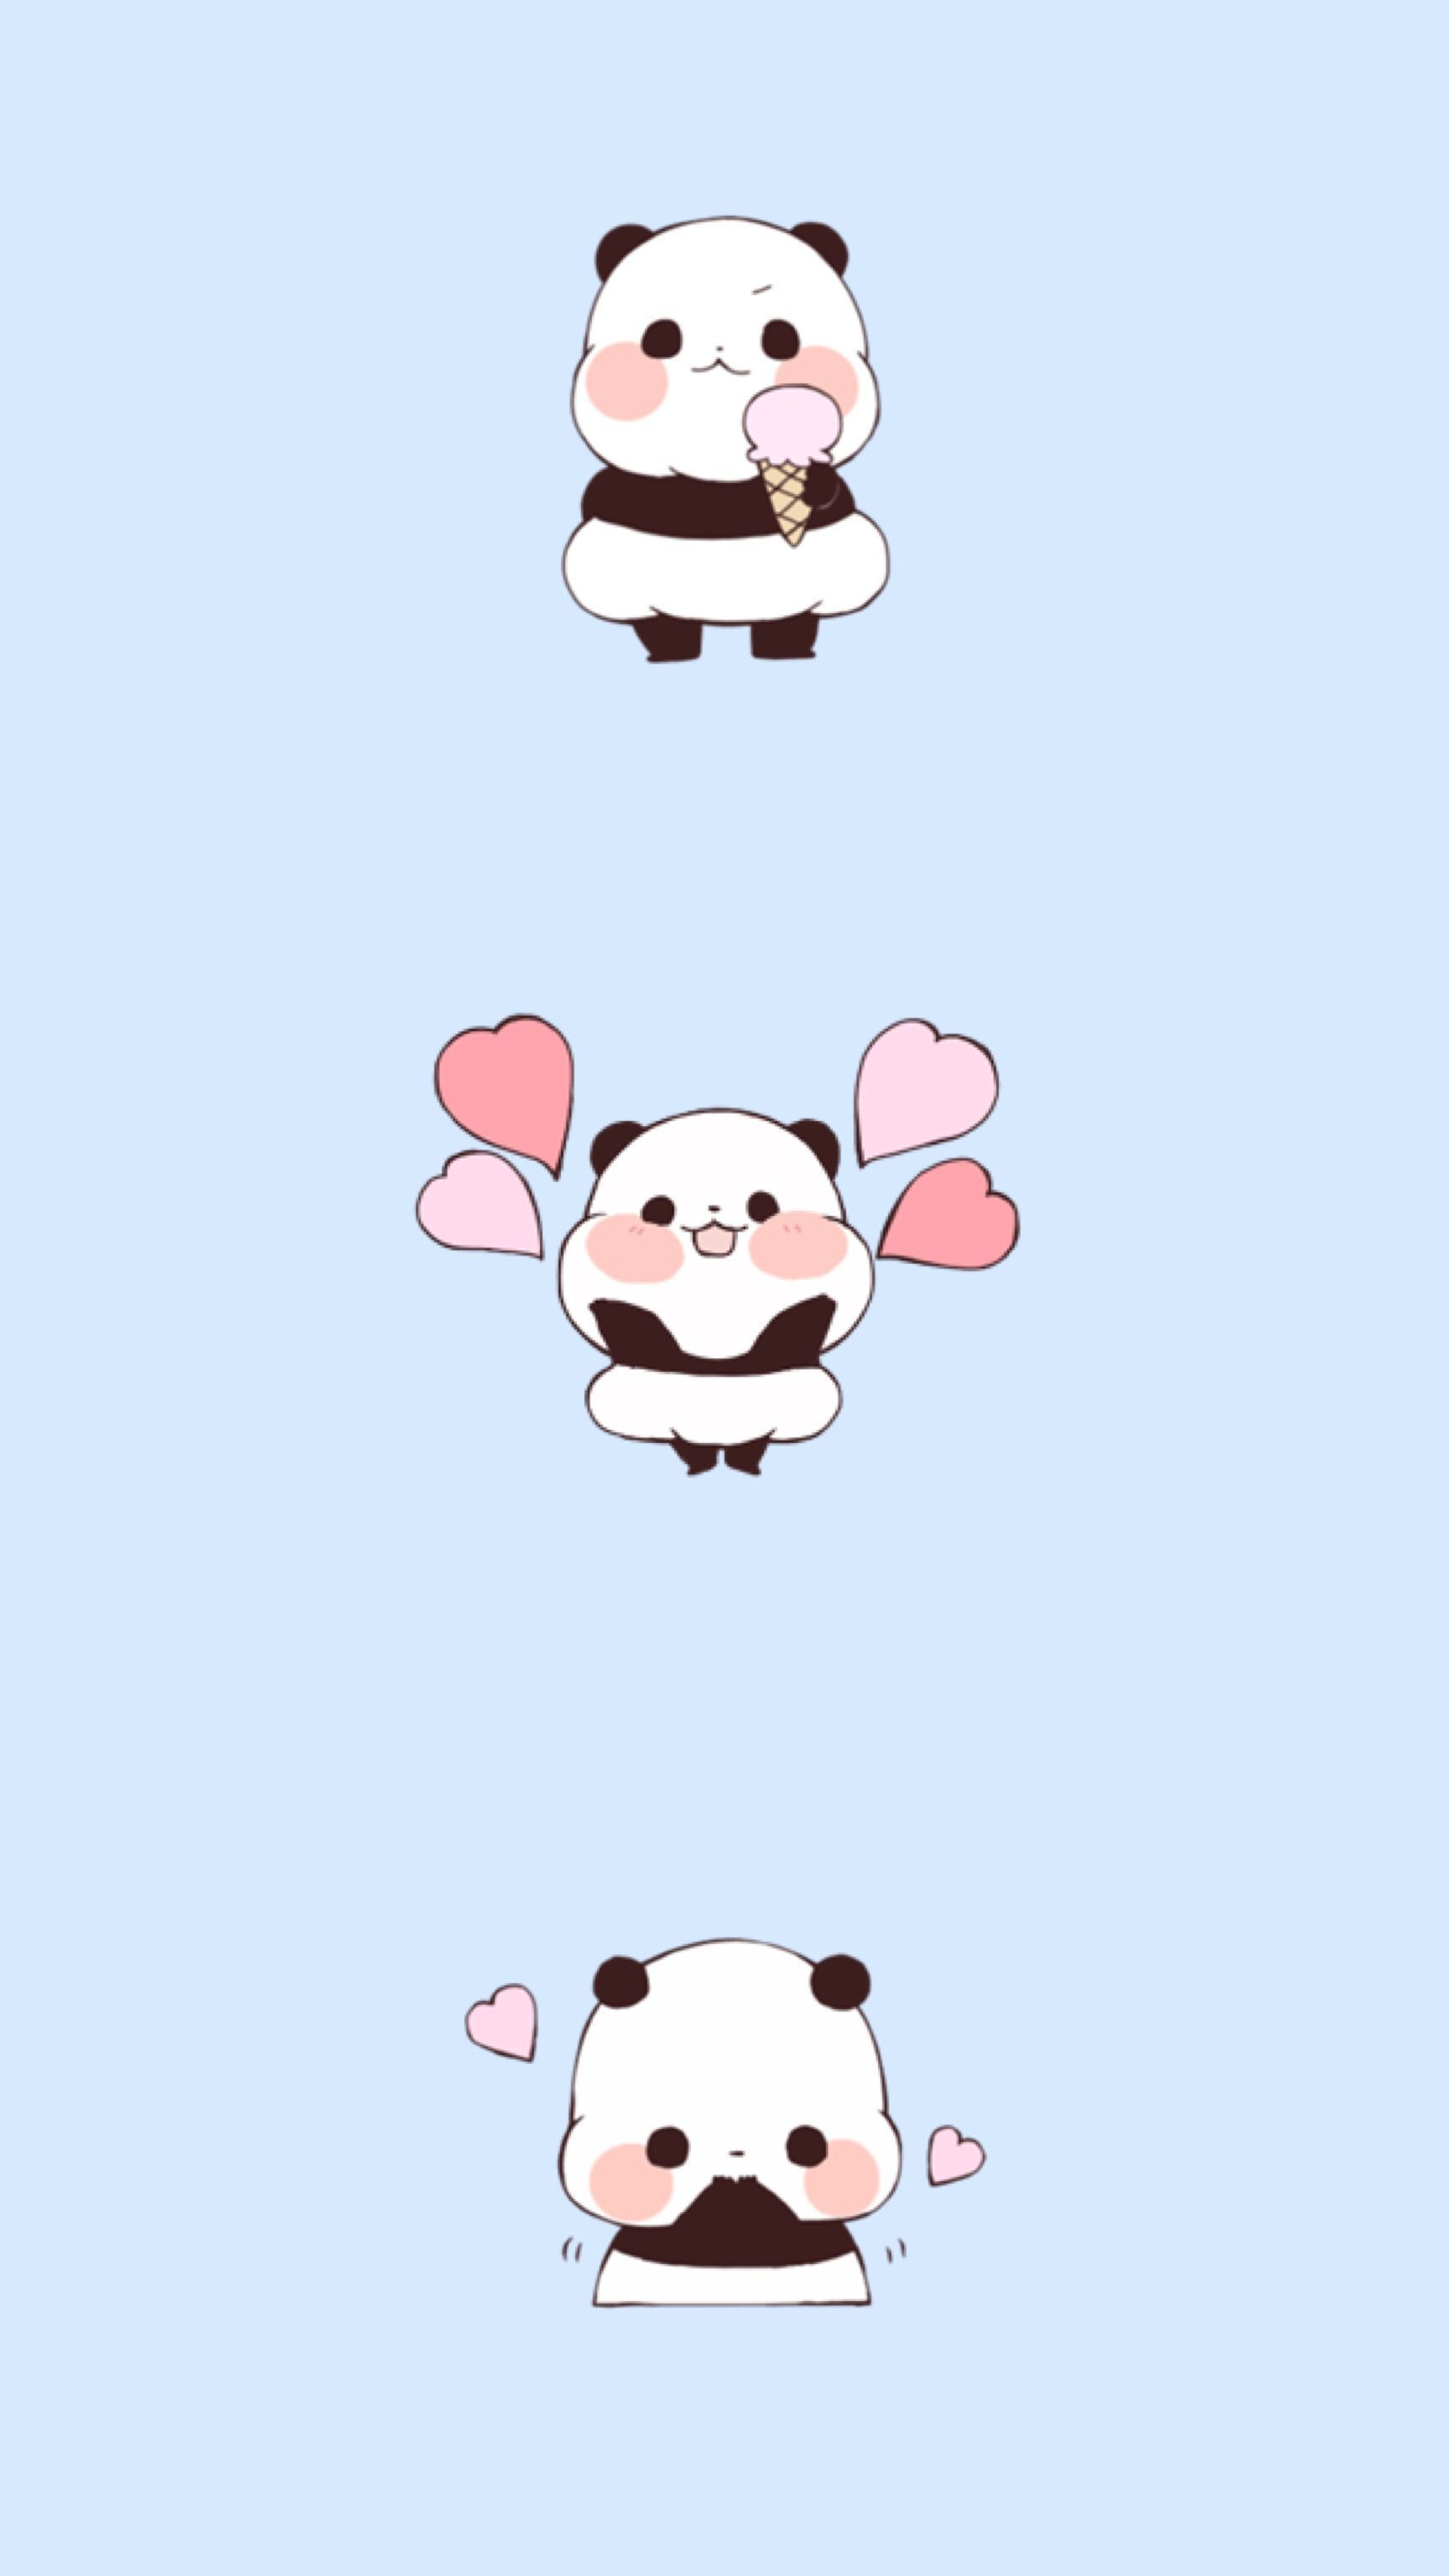 We Bare Bears Wallpaper Hd In 2020 Cute Panda Wallpaper Cute Cartoon Wallpapers Panda Wallpapers